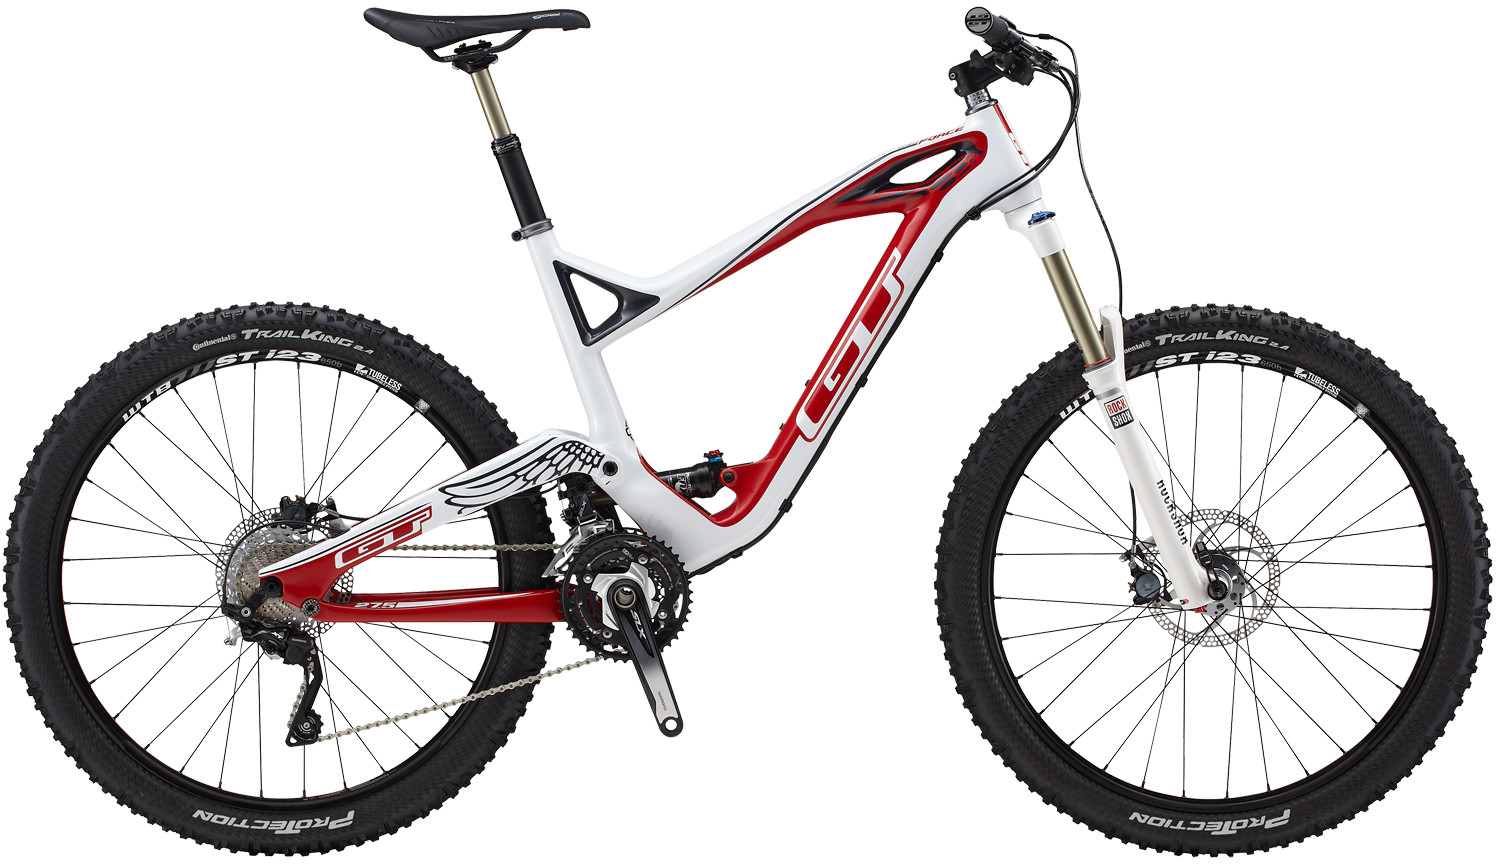 2014 GT Force Carbon Expert Bike g14_650m_force_expert_wht_3